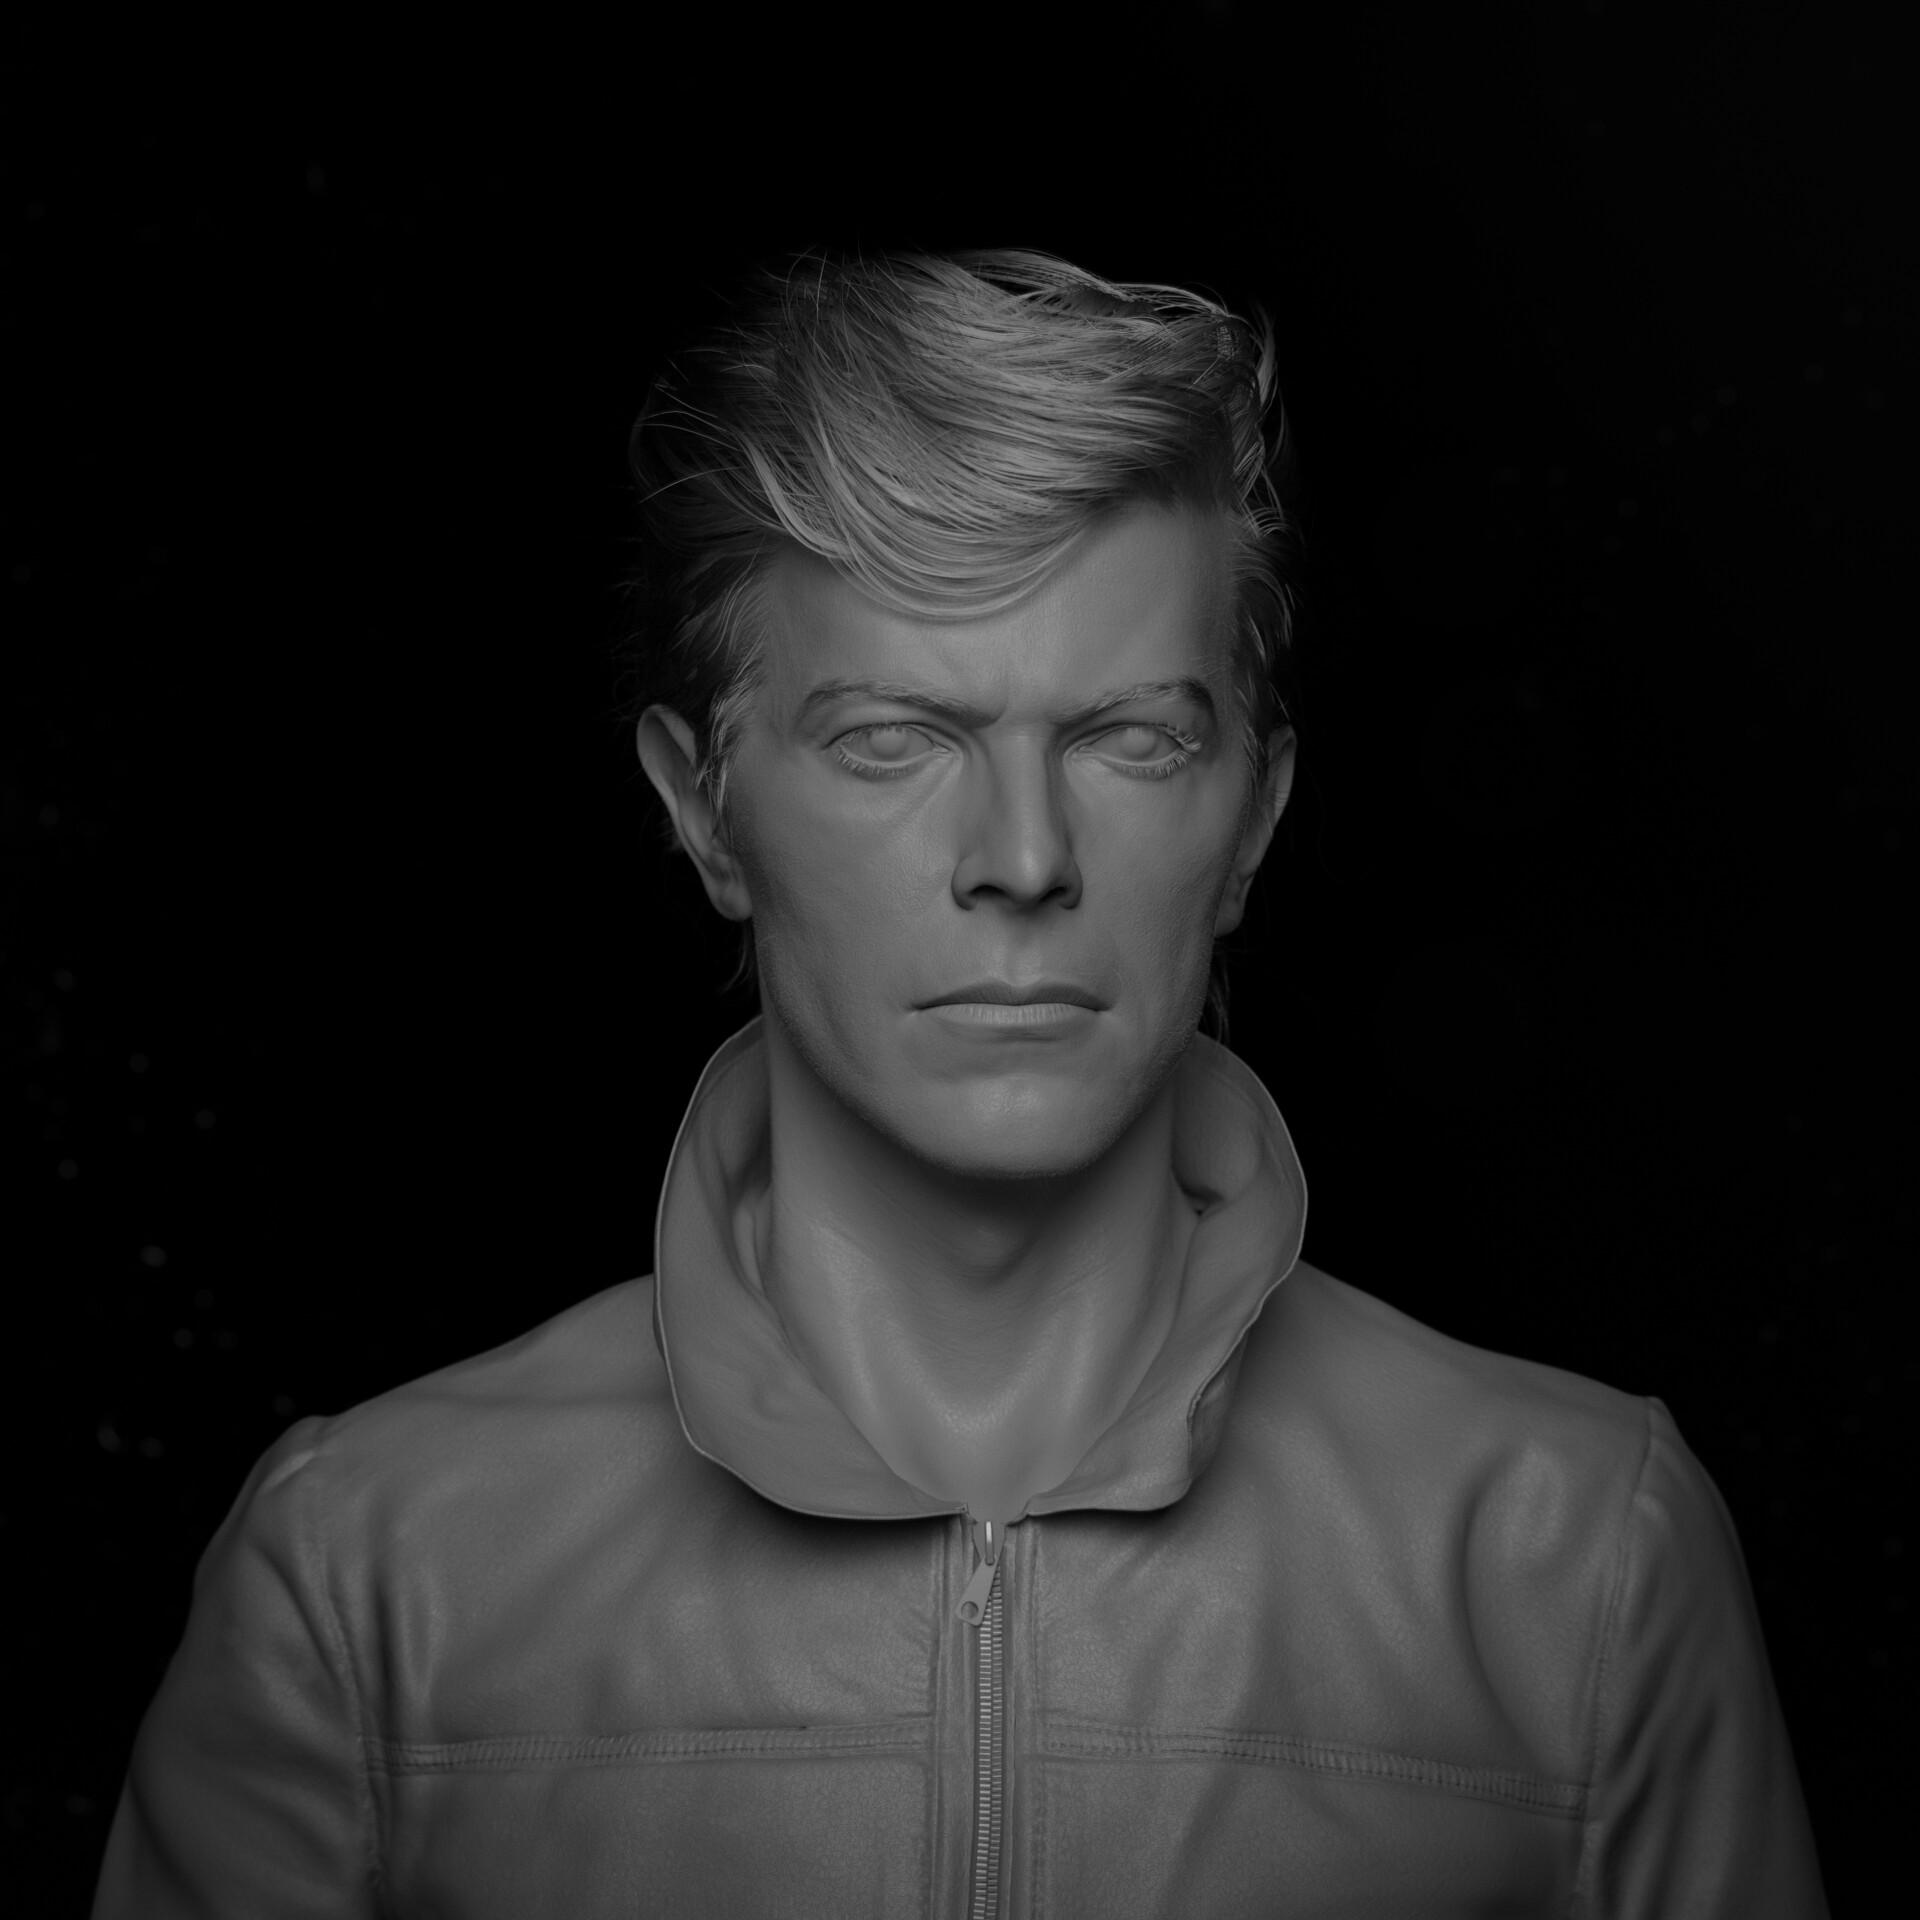 hadi karimi david bowie 3D portrait